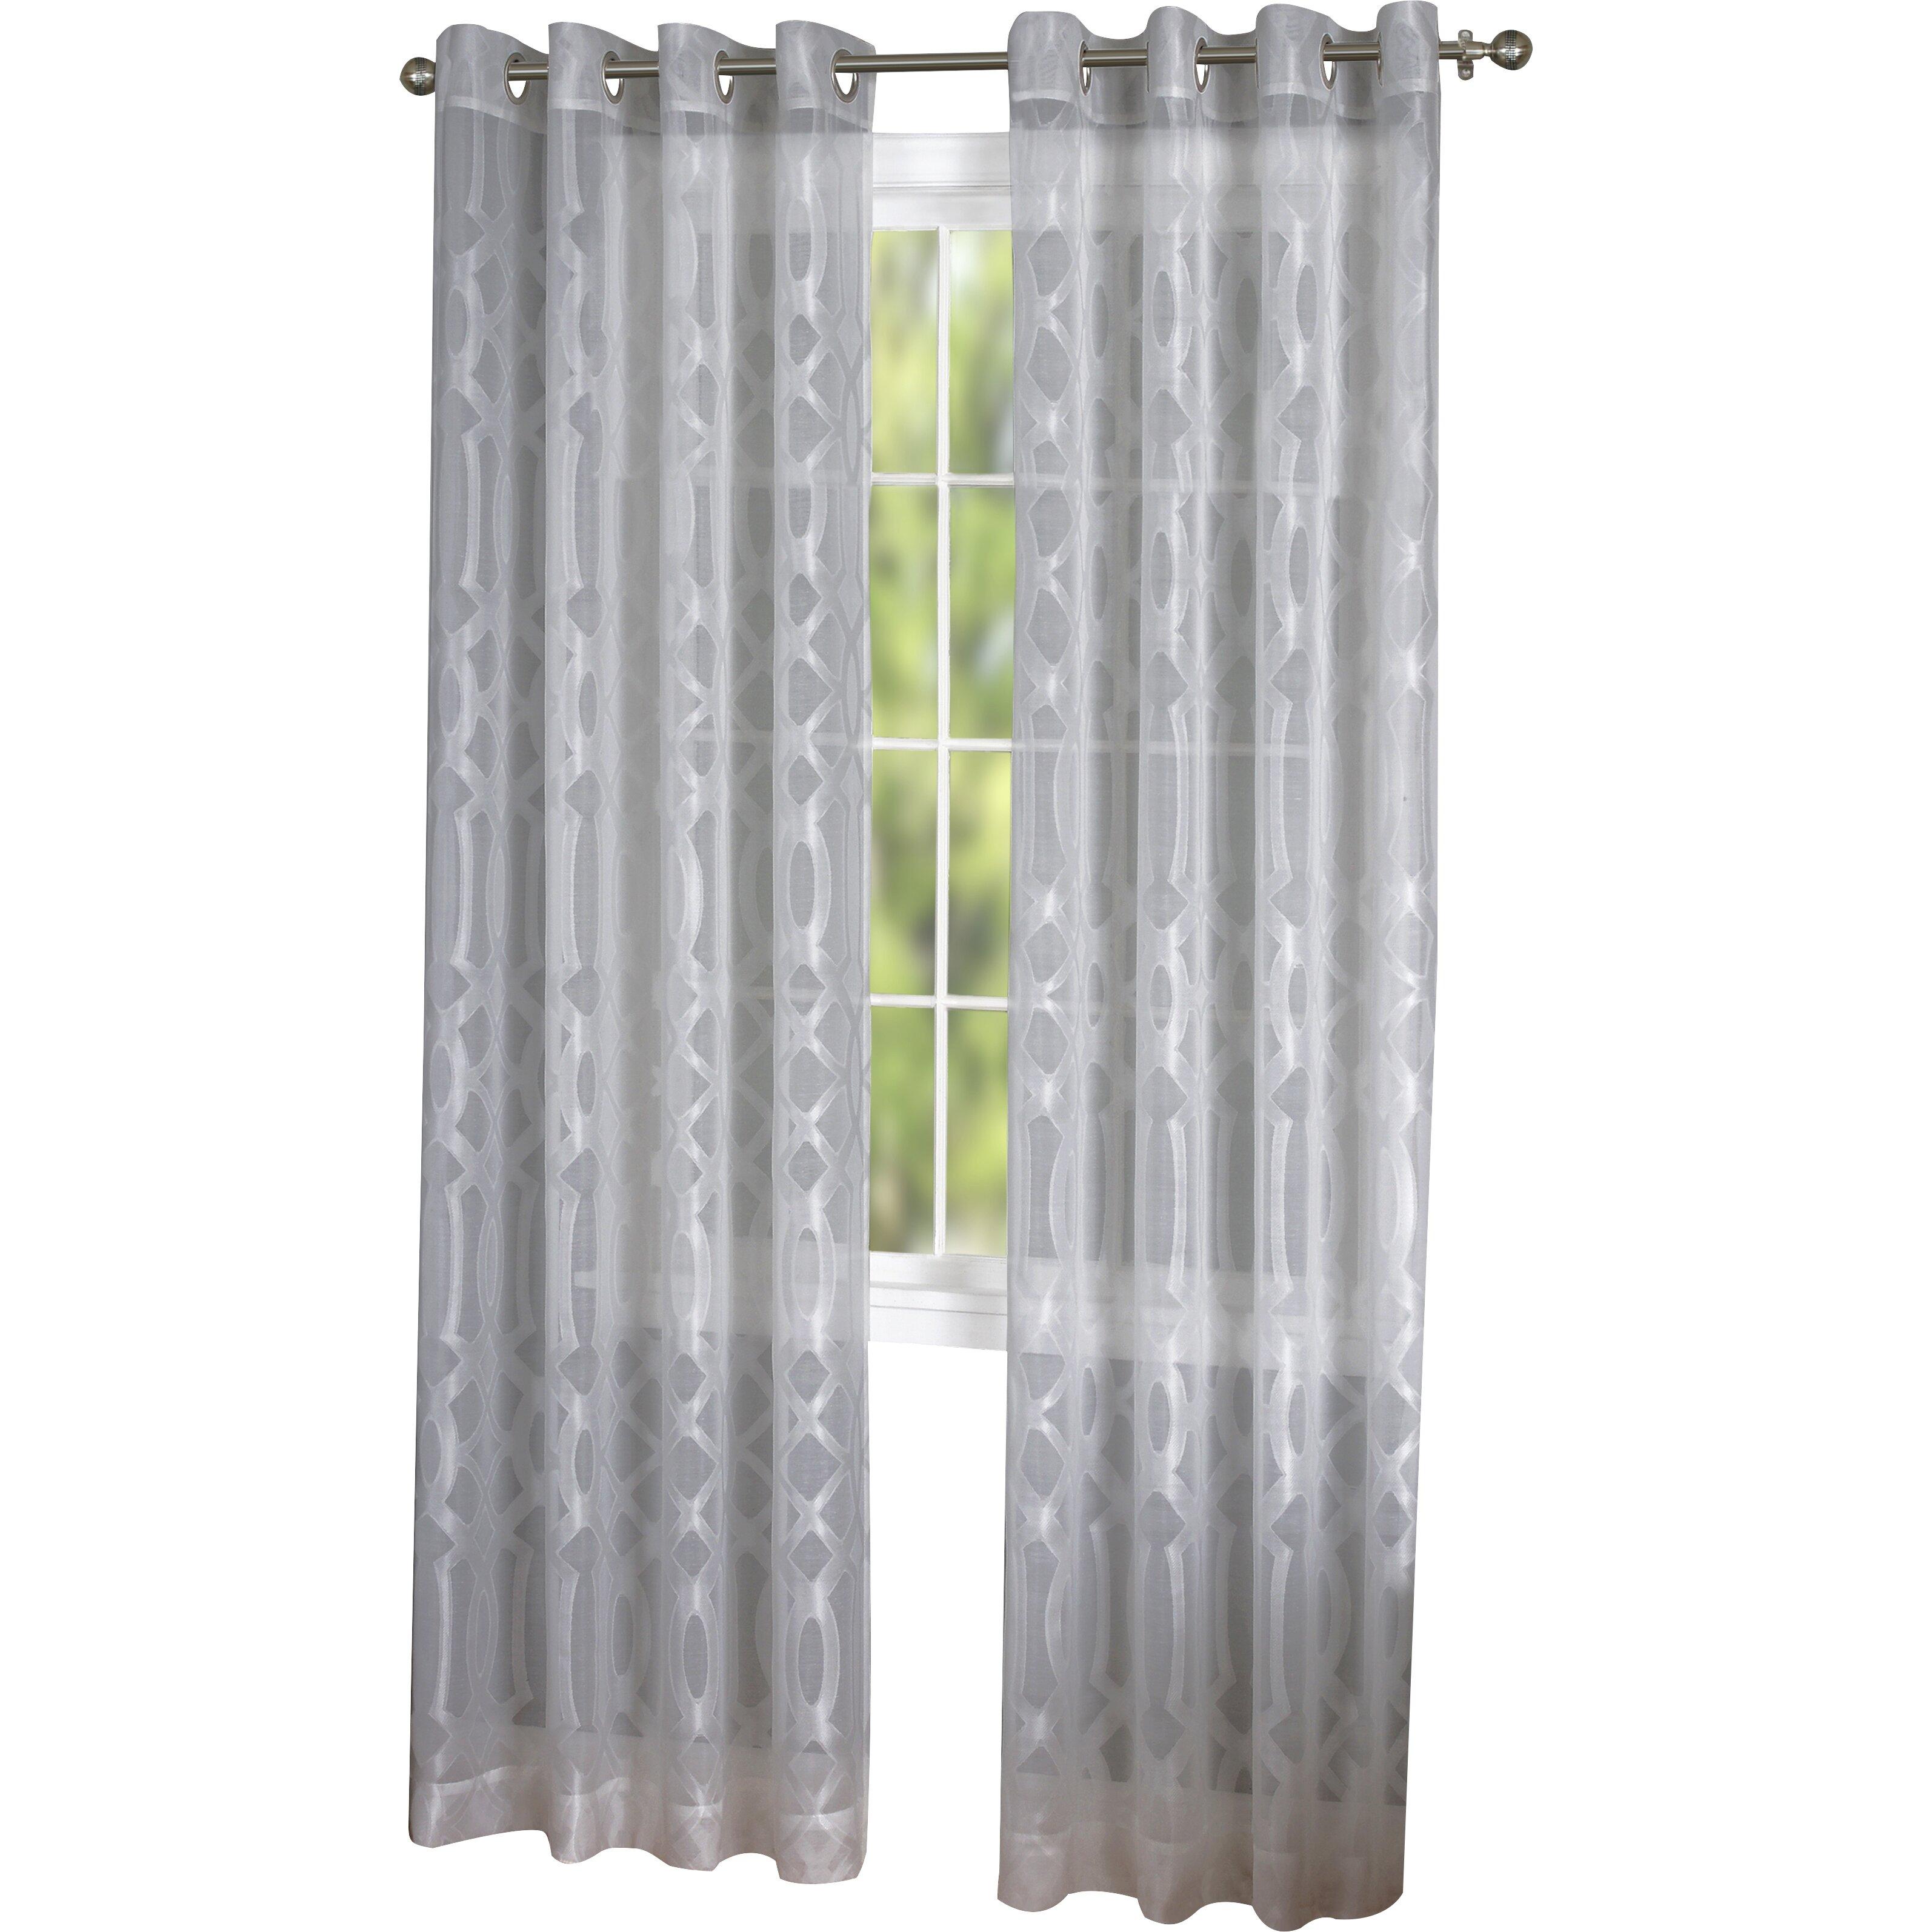 elrene home fashions latique sheer window curtain panel